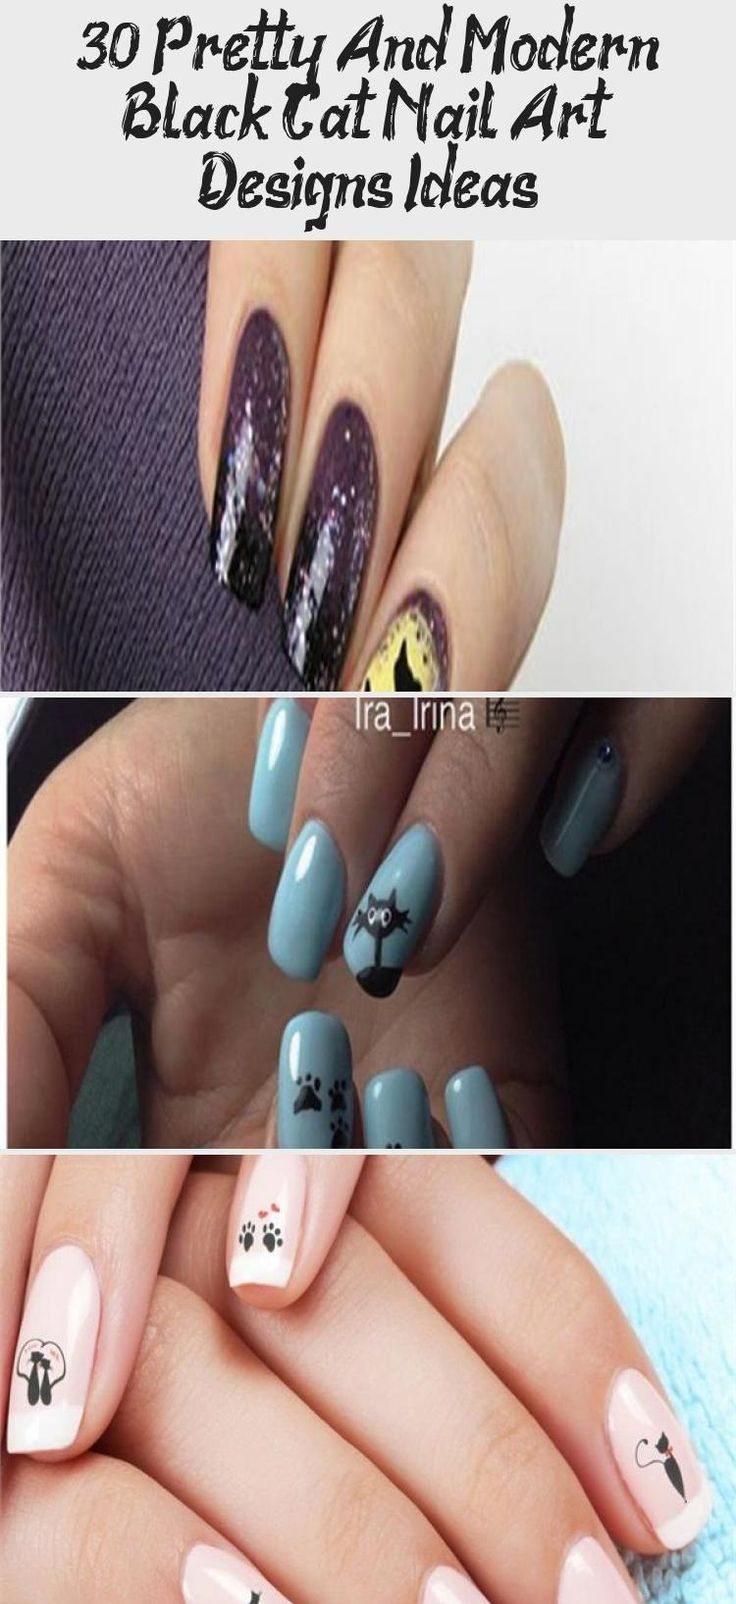 30+ Pretty And Modern Black Cat Nail Art Designs Ideas ...